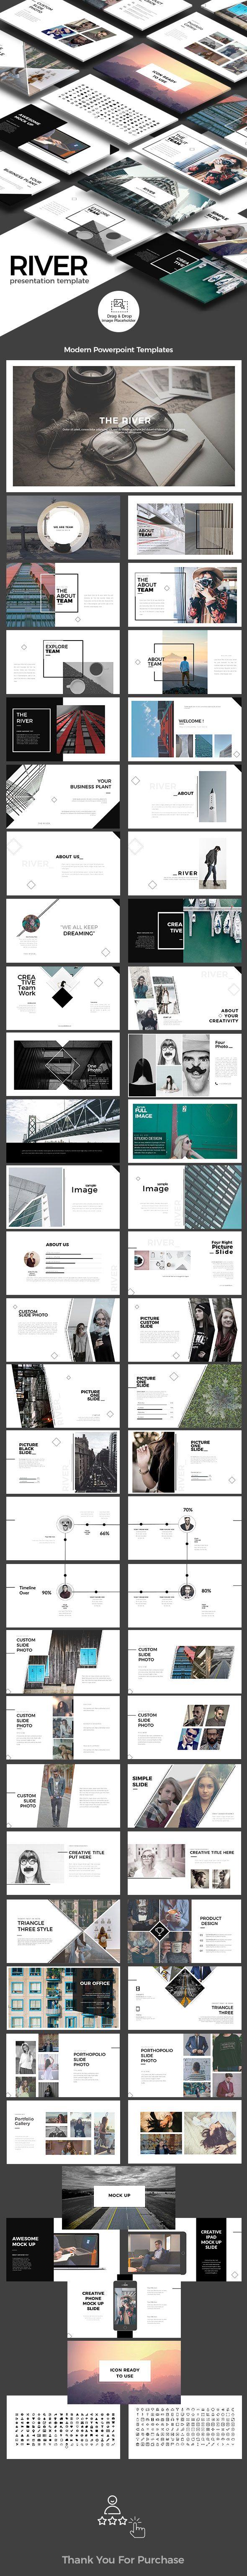 River presentation template brochuras apresentao e fundo river presentation template toneelgroepblik Choice Image